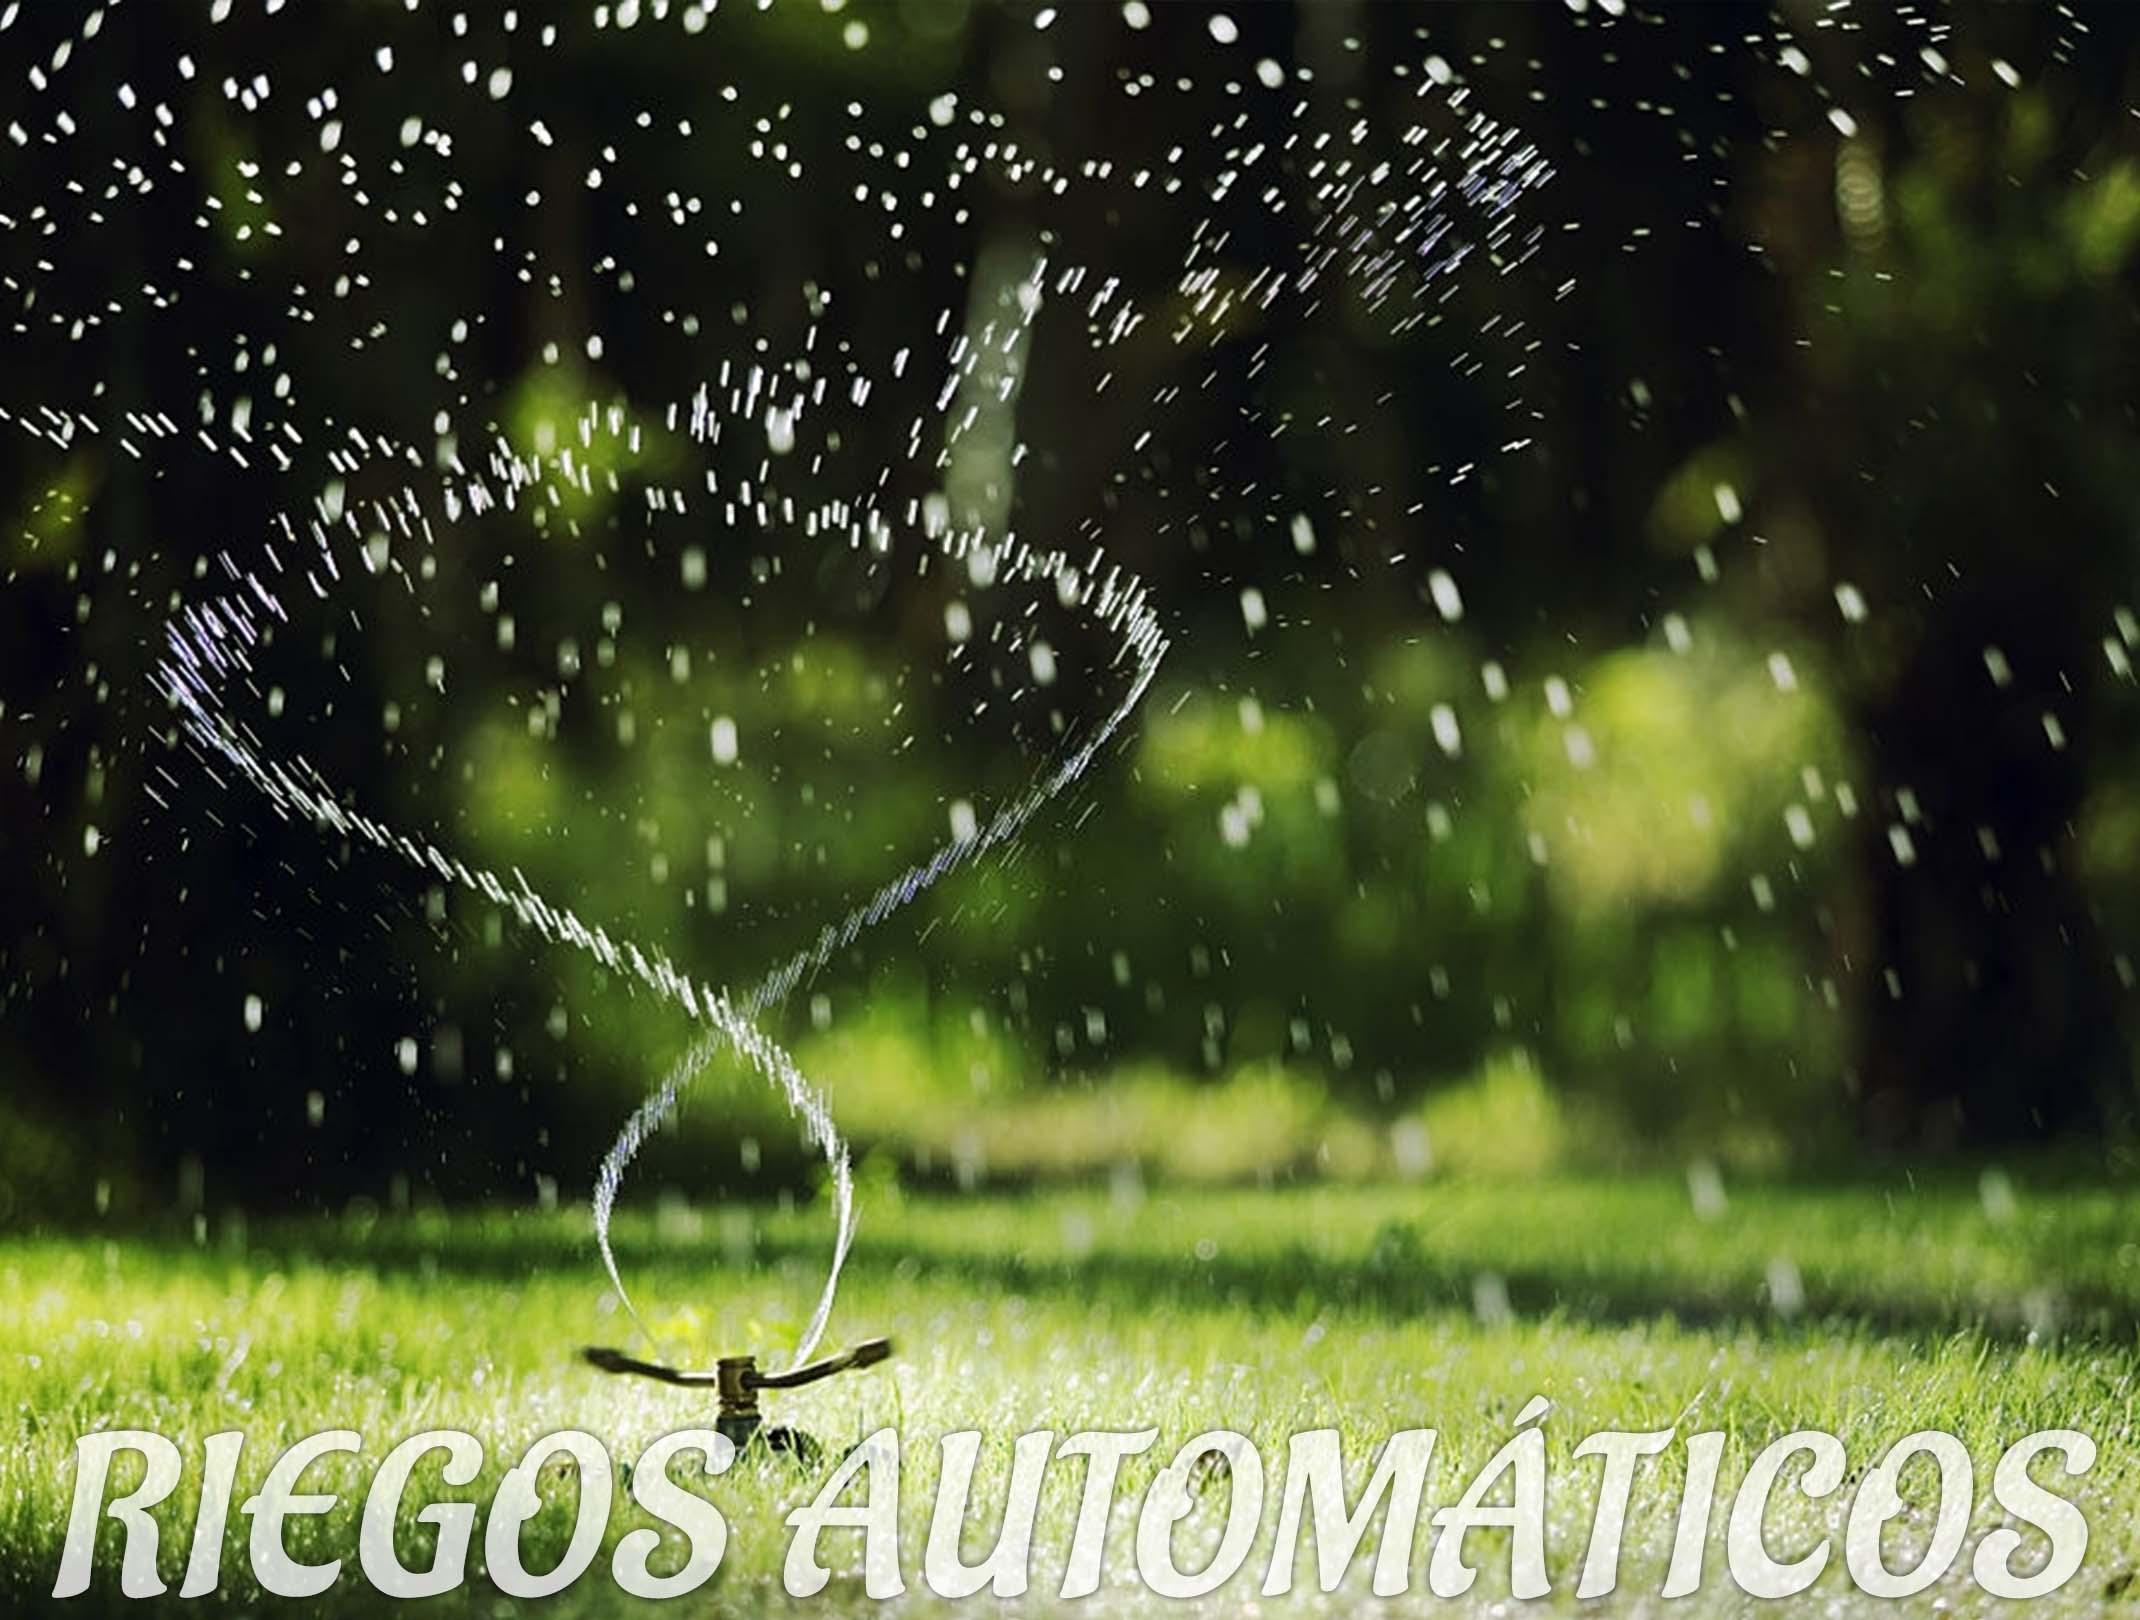 RIEGOS AUTOMATICOS